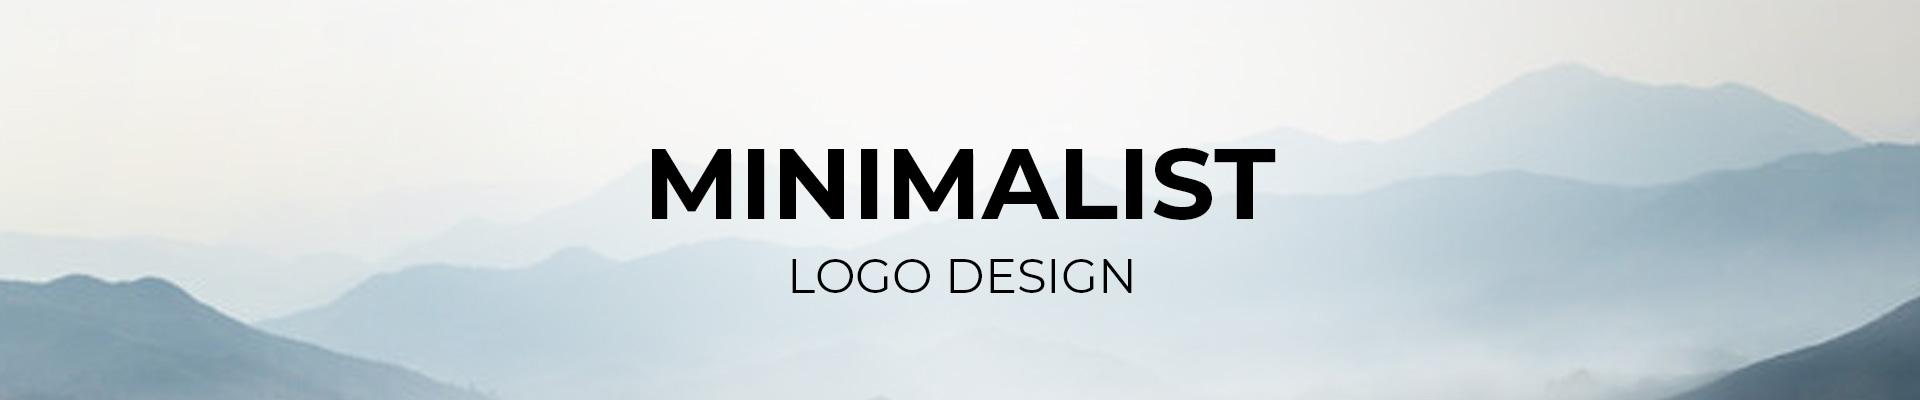 Minimalist Concept Logo Design